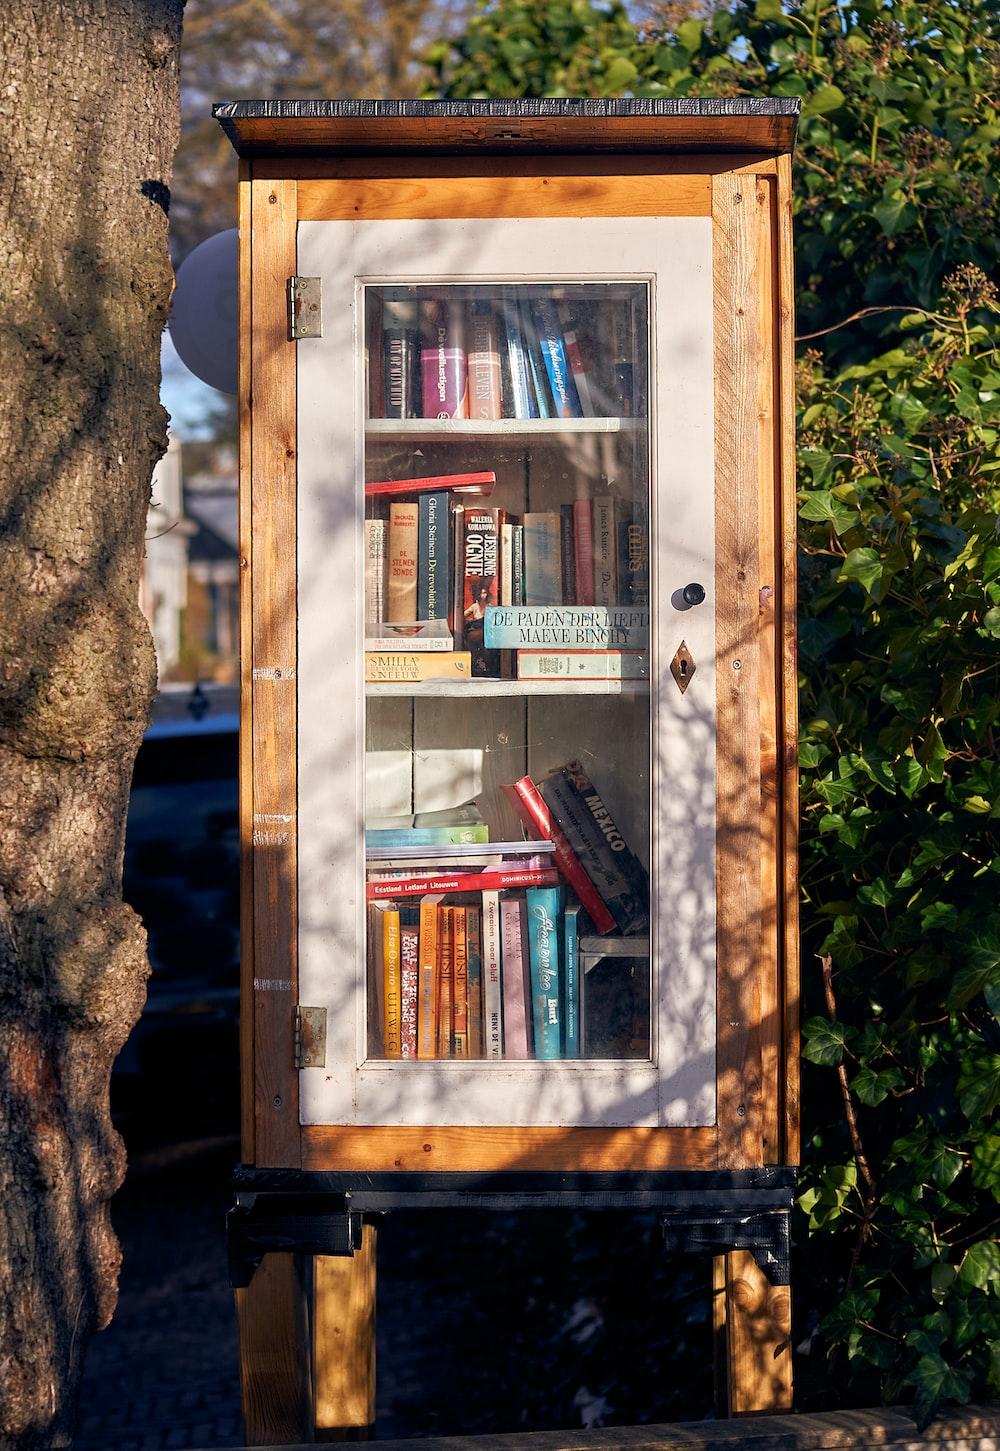 books in brown wooden shelf